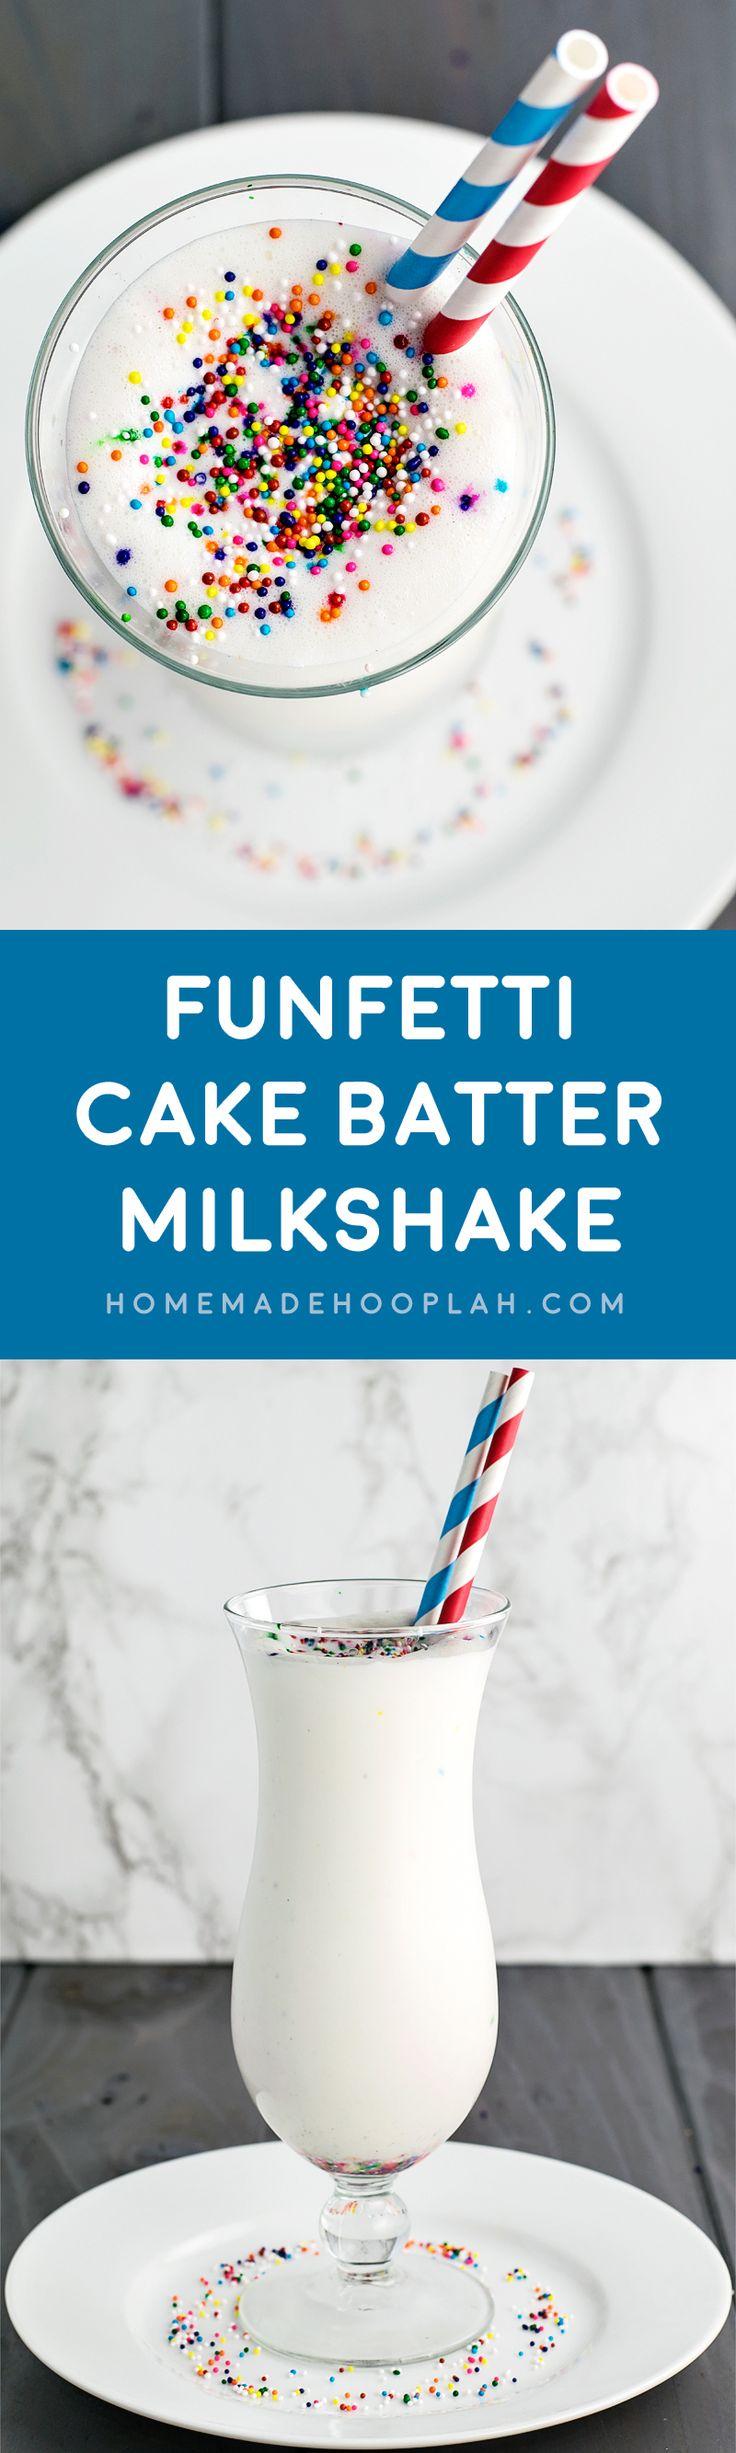 Funfetti Cake Batter Milkshake! A festive milkshake that's only 4 ingredients: creamy ice cream, rich cake mix, milk, and festive sprinkles.